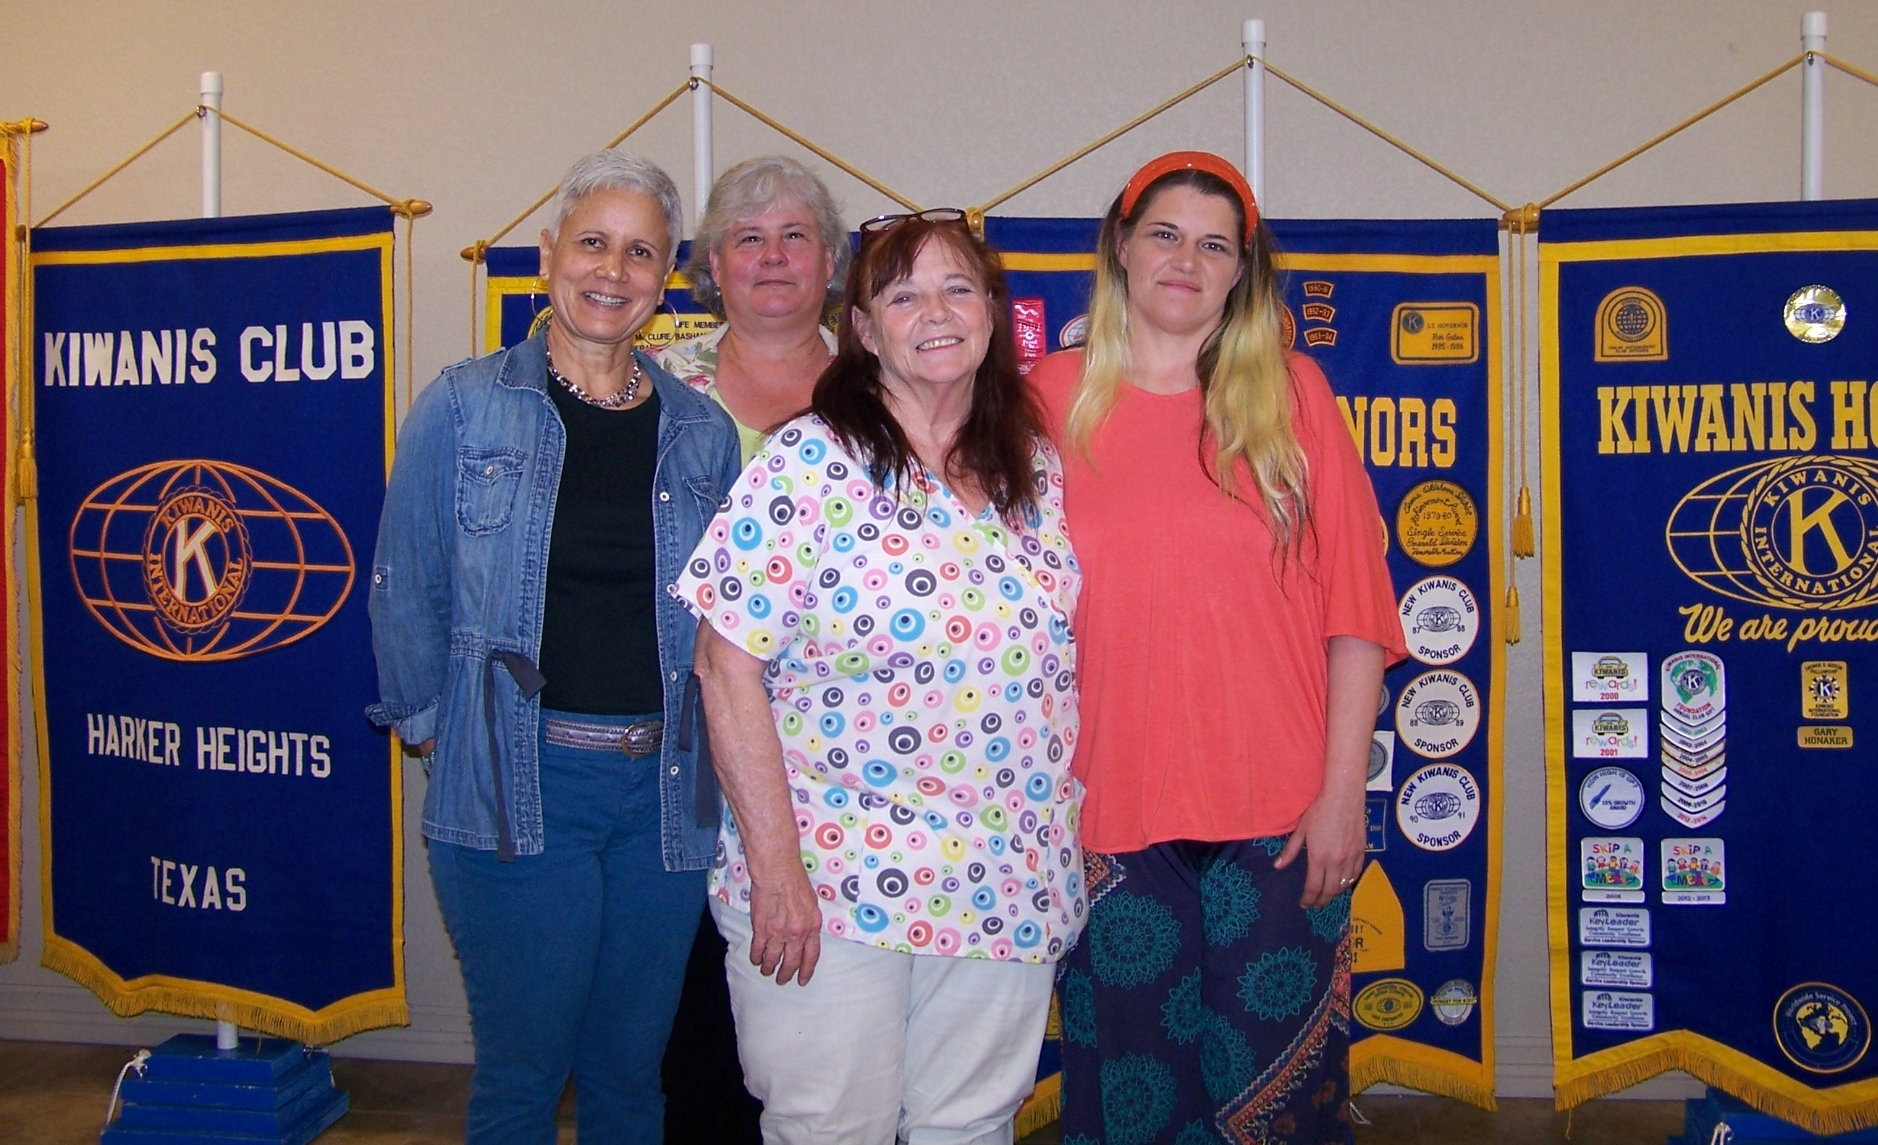 Cynthia Holland,Elizabeth Berkhoudt,Linda Dawson, Vanisse Higginbotham